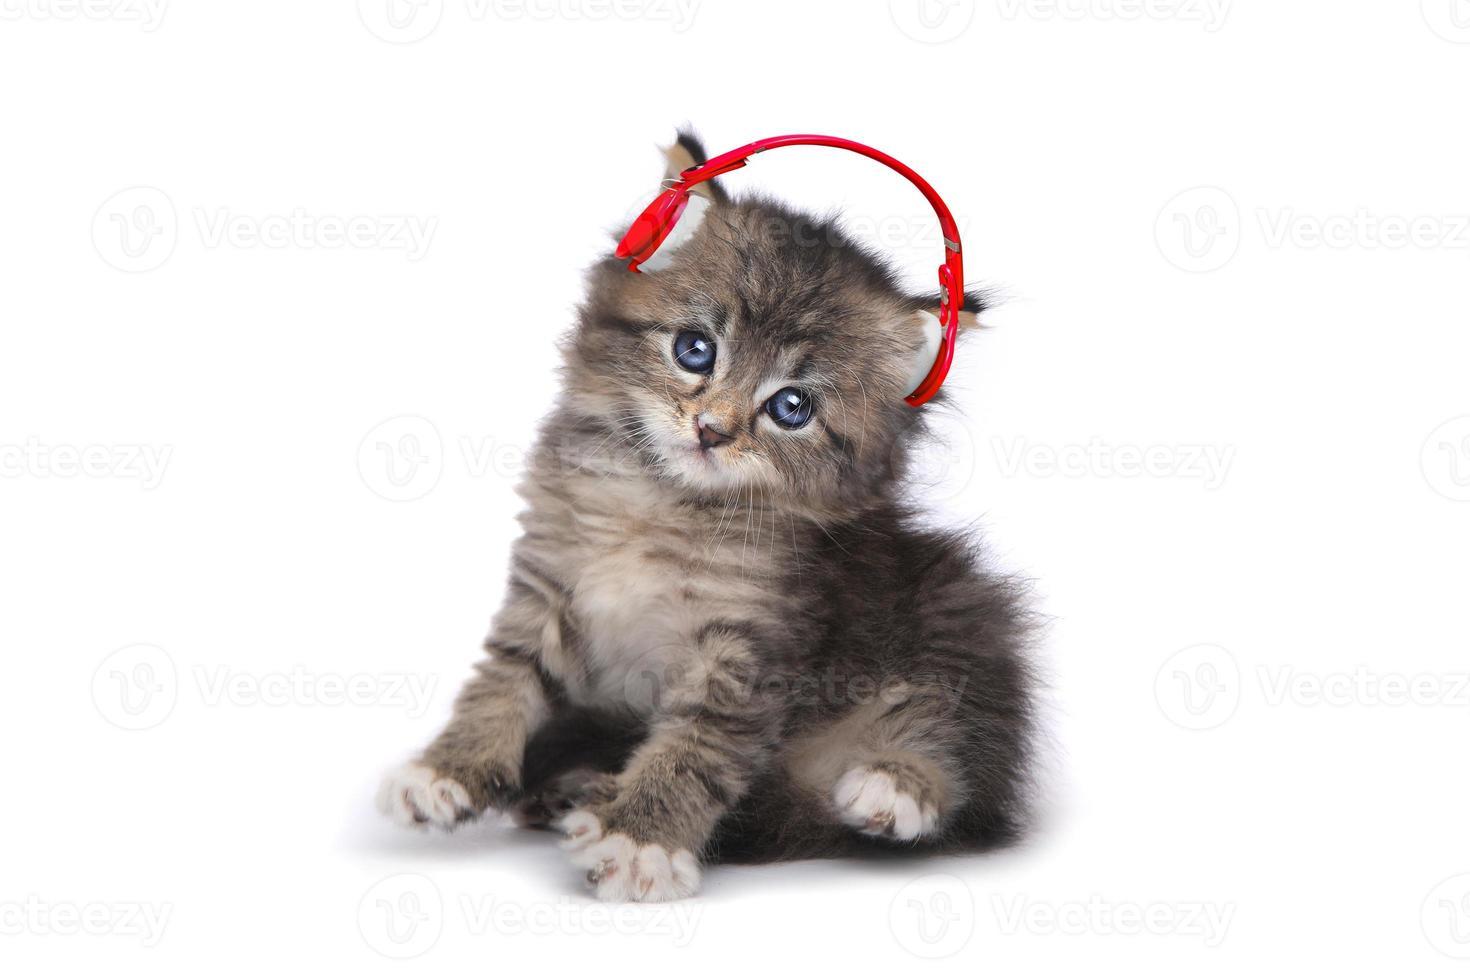 gatito sobre un fondo blanco escuchando música foto